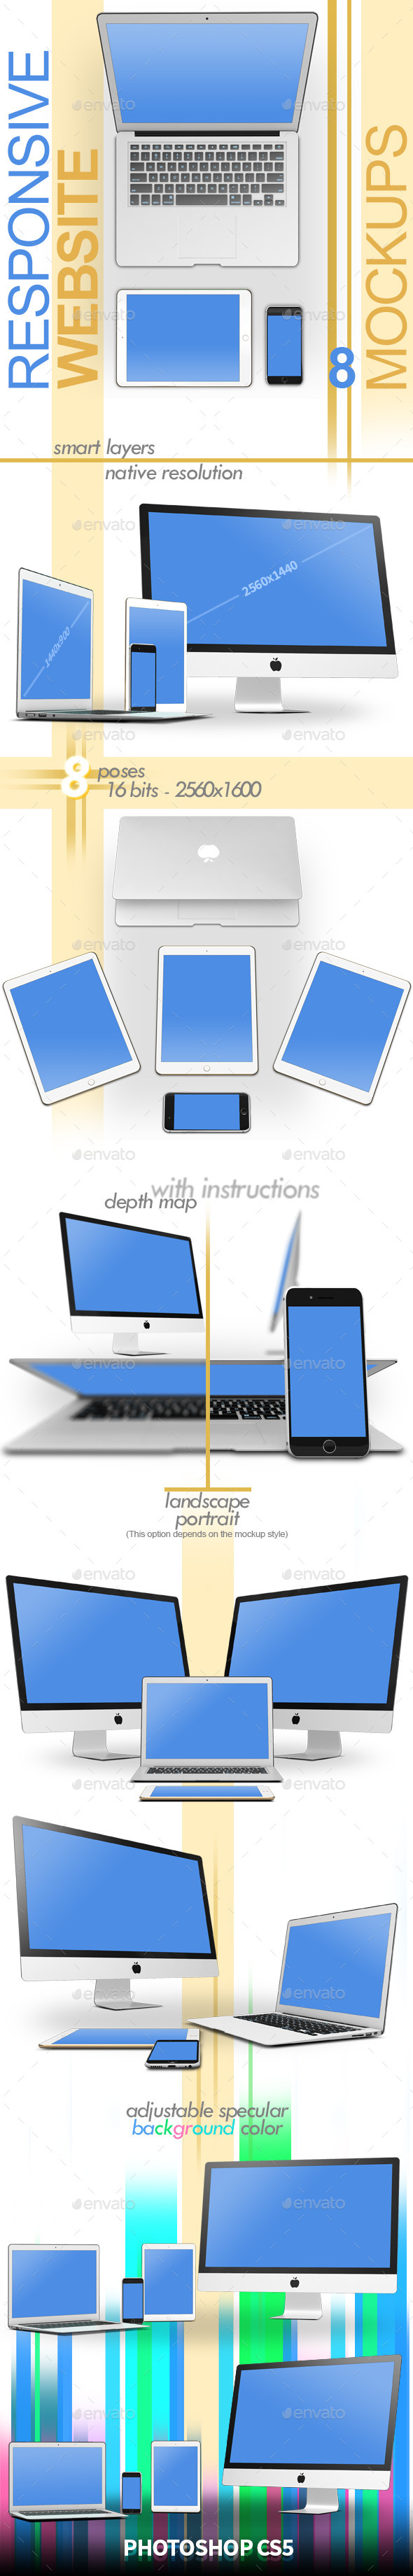 GraphicRiver Responsive Website 8 Mock-ups 11146965